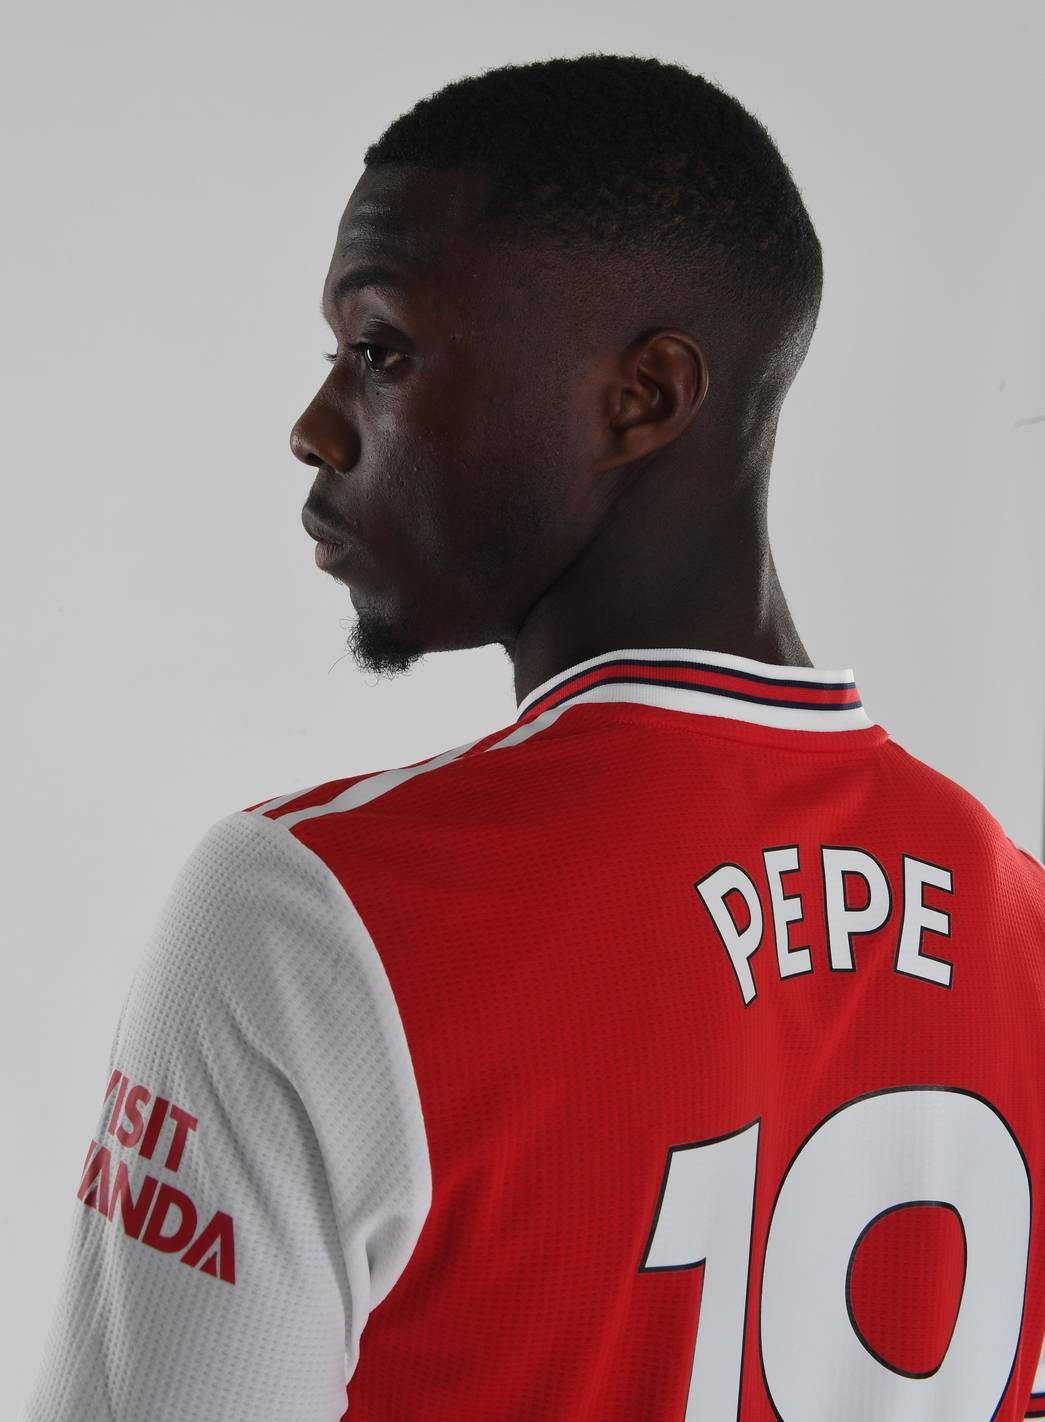 Pepe%2042%20190730MAFC.jpg?itok=kQ-U3GF3